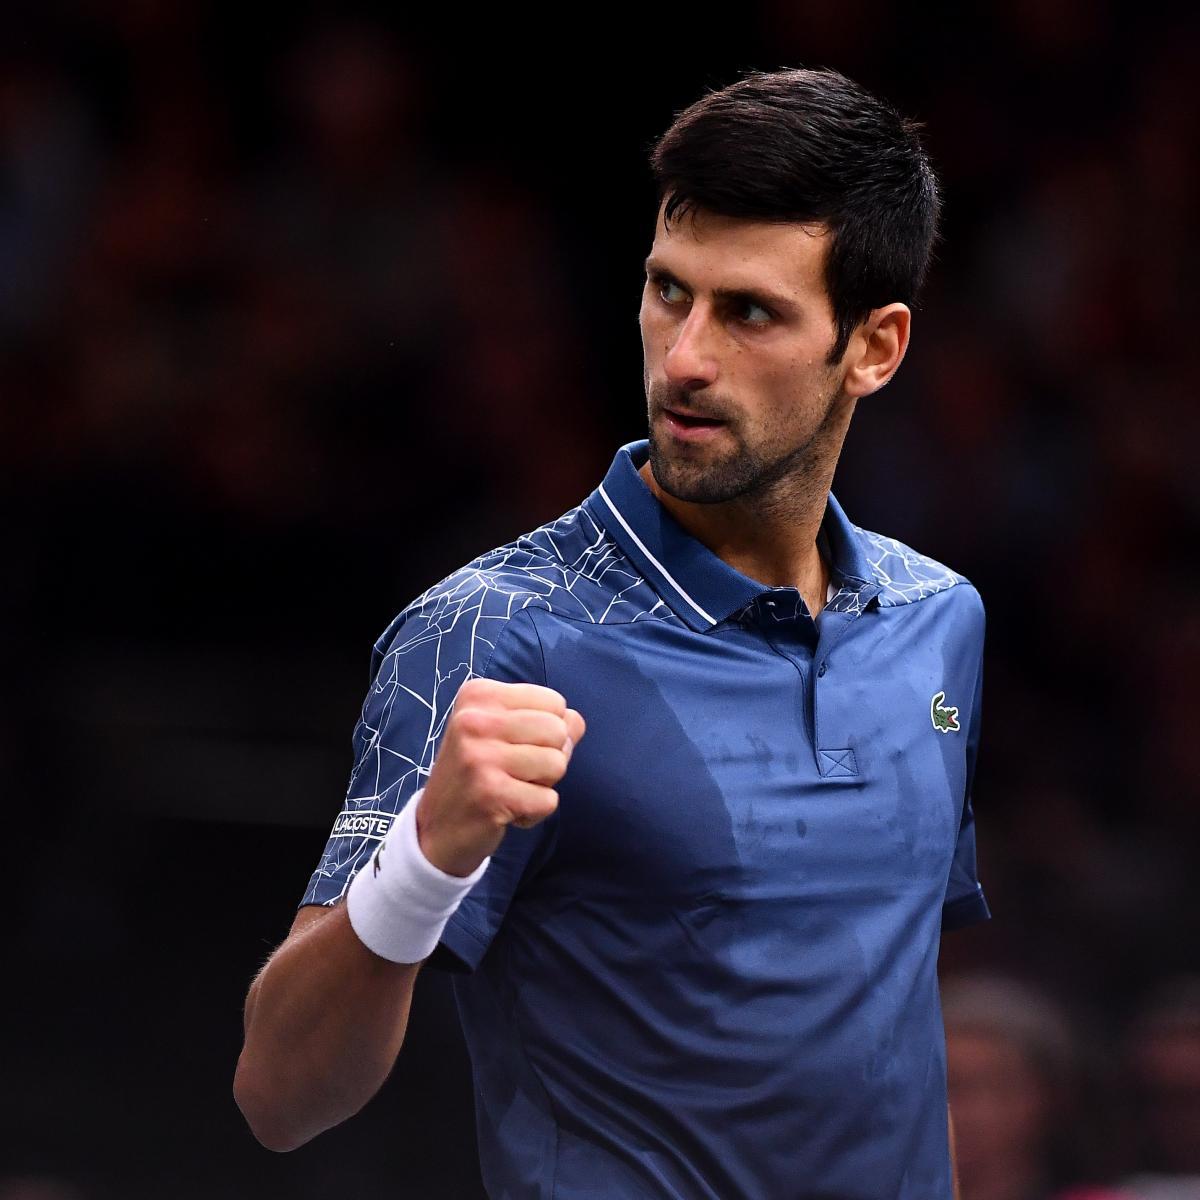 Australian Open 2019: Draw Date, Time, Live Stream Info